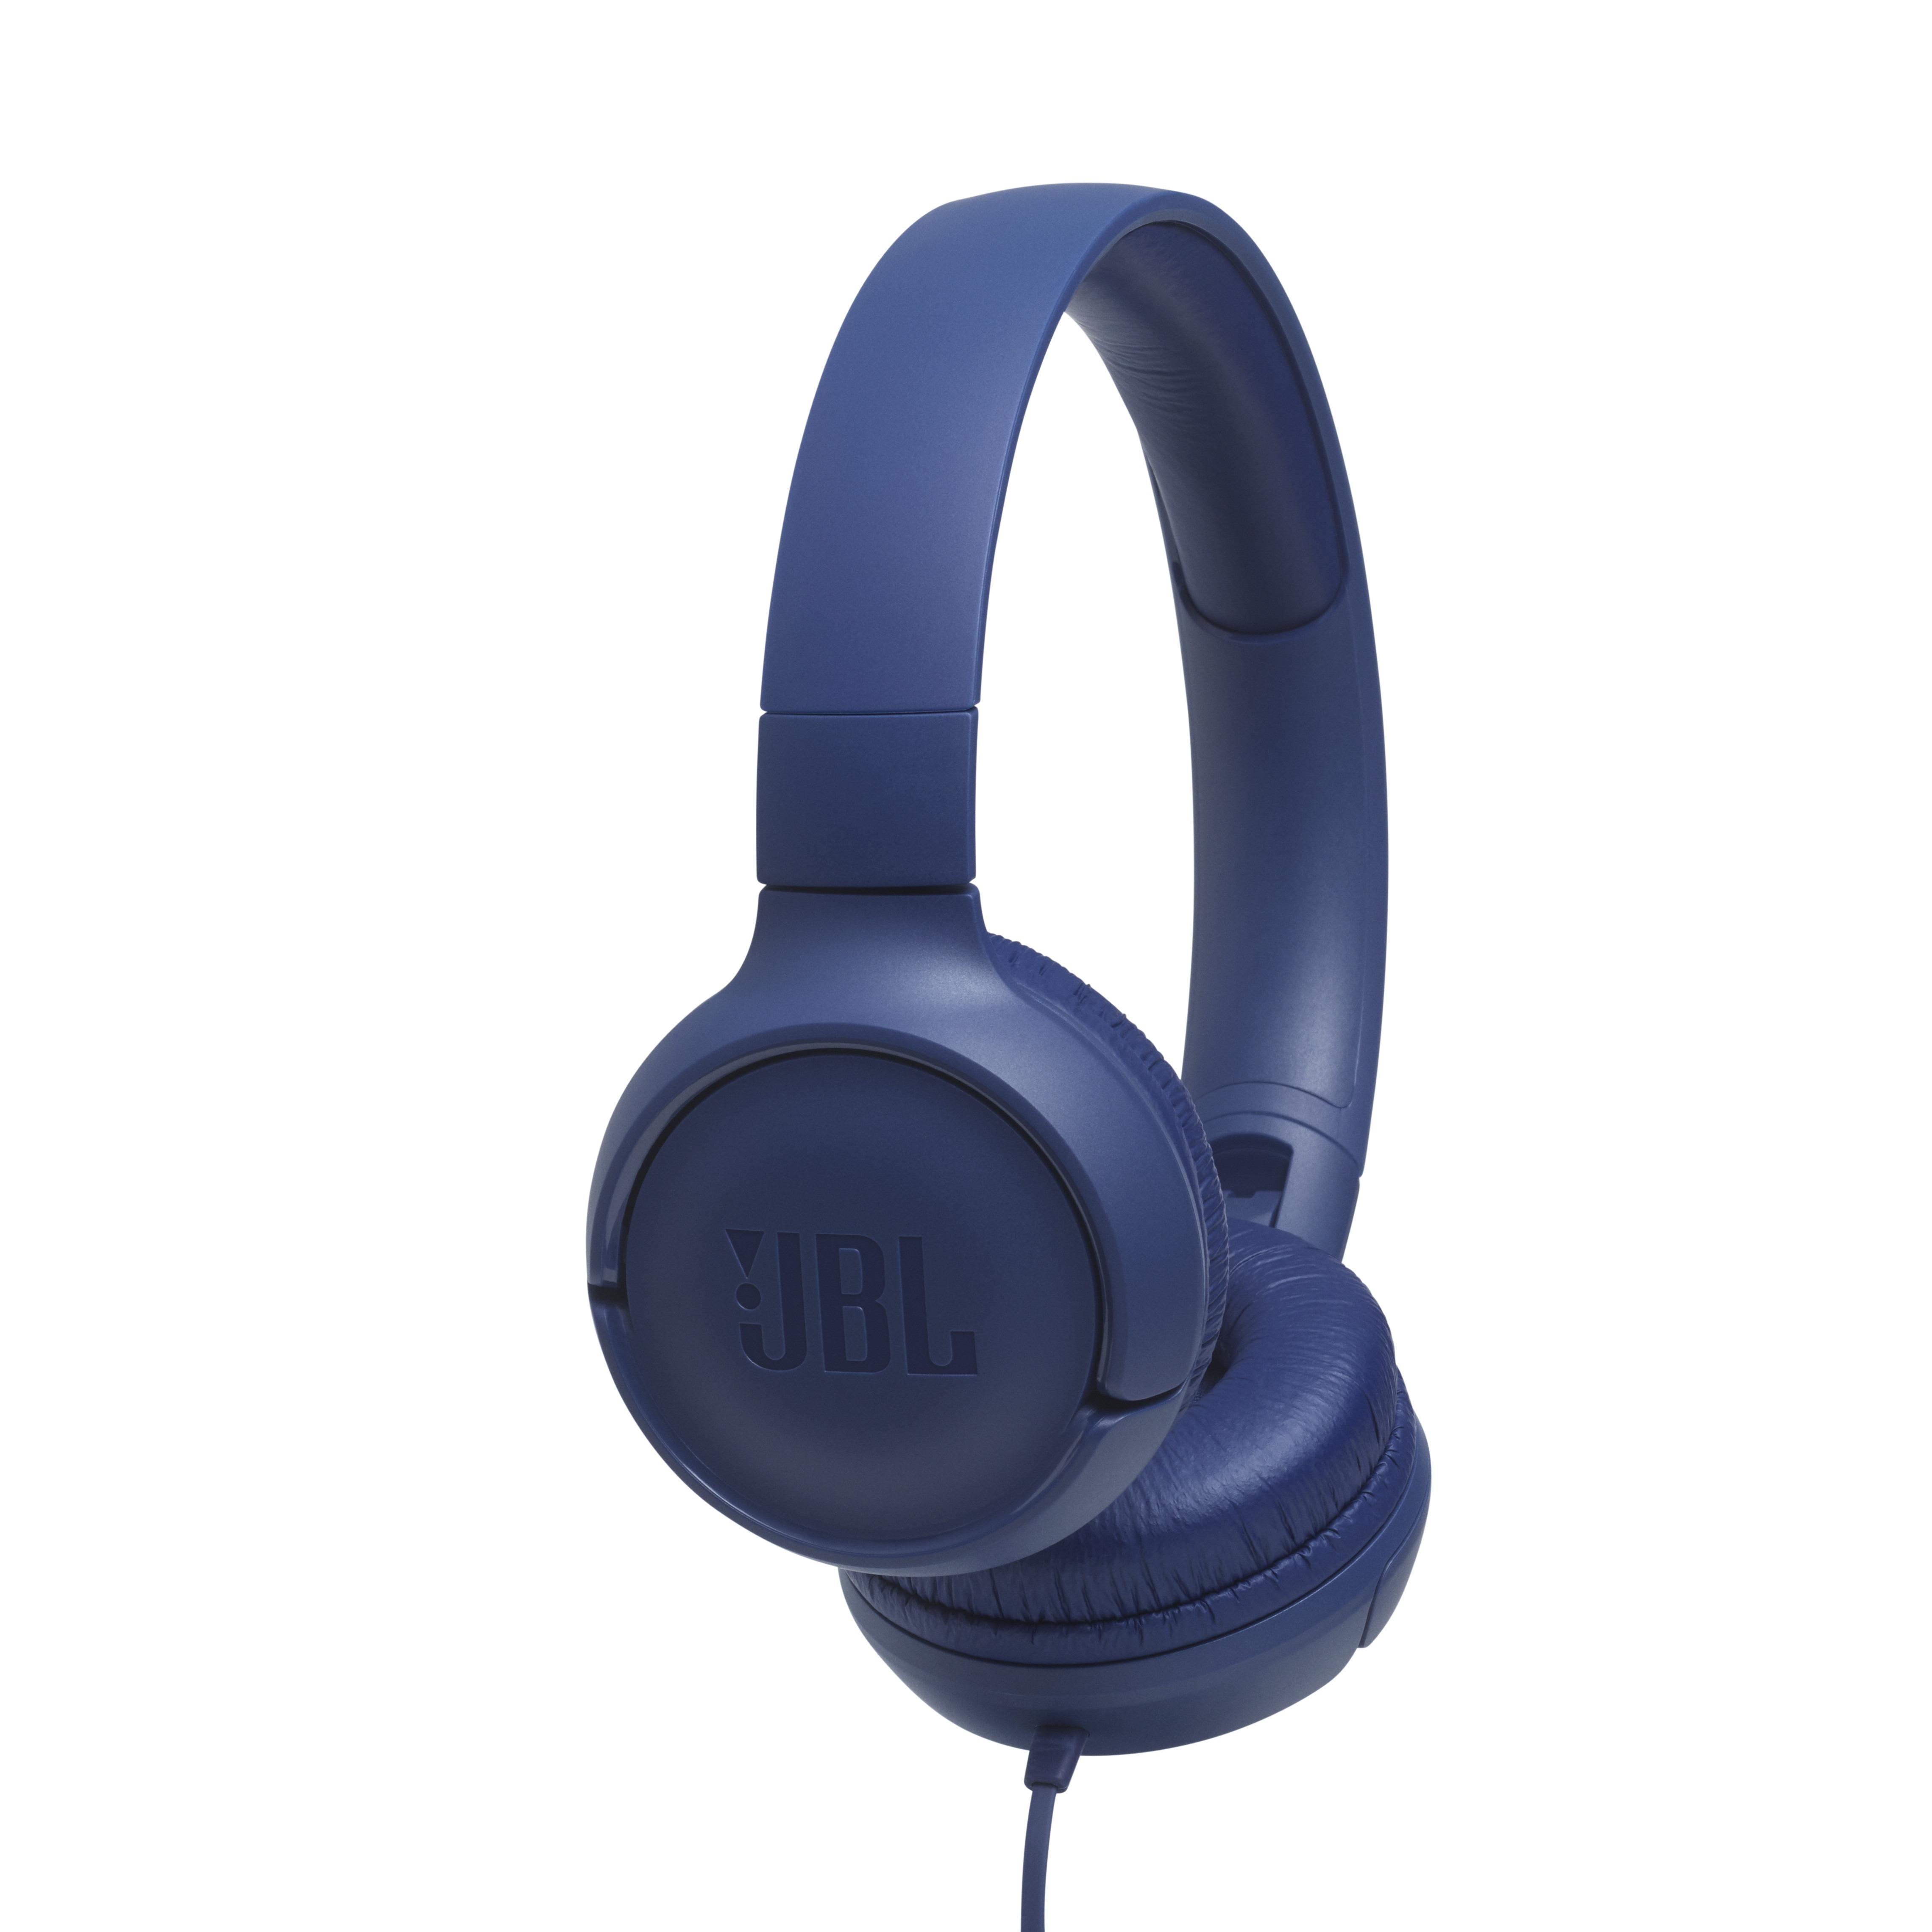 Korting JBL Tune 500 hoofdtelefoon